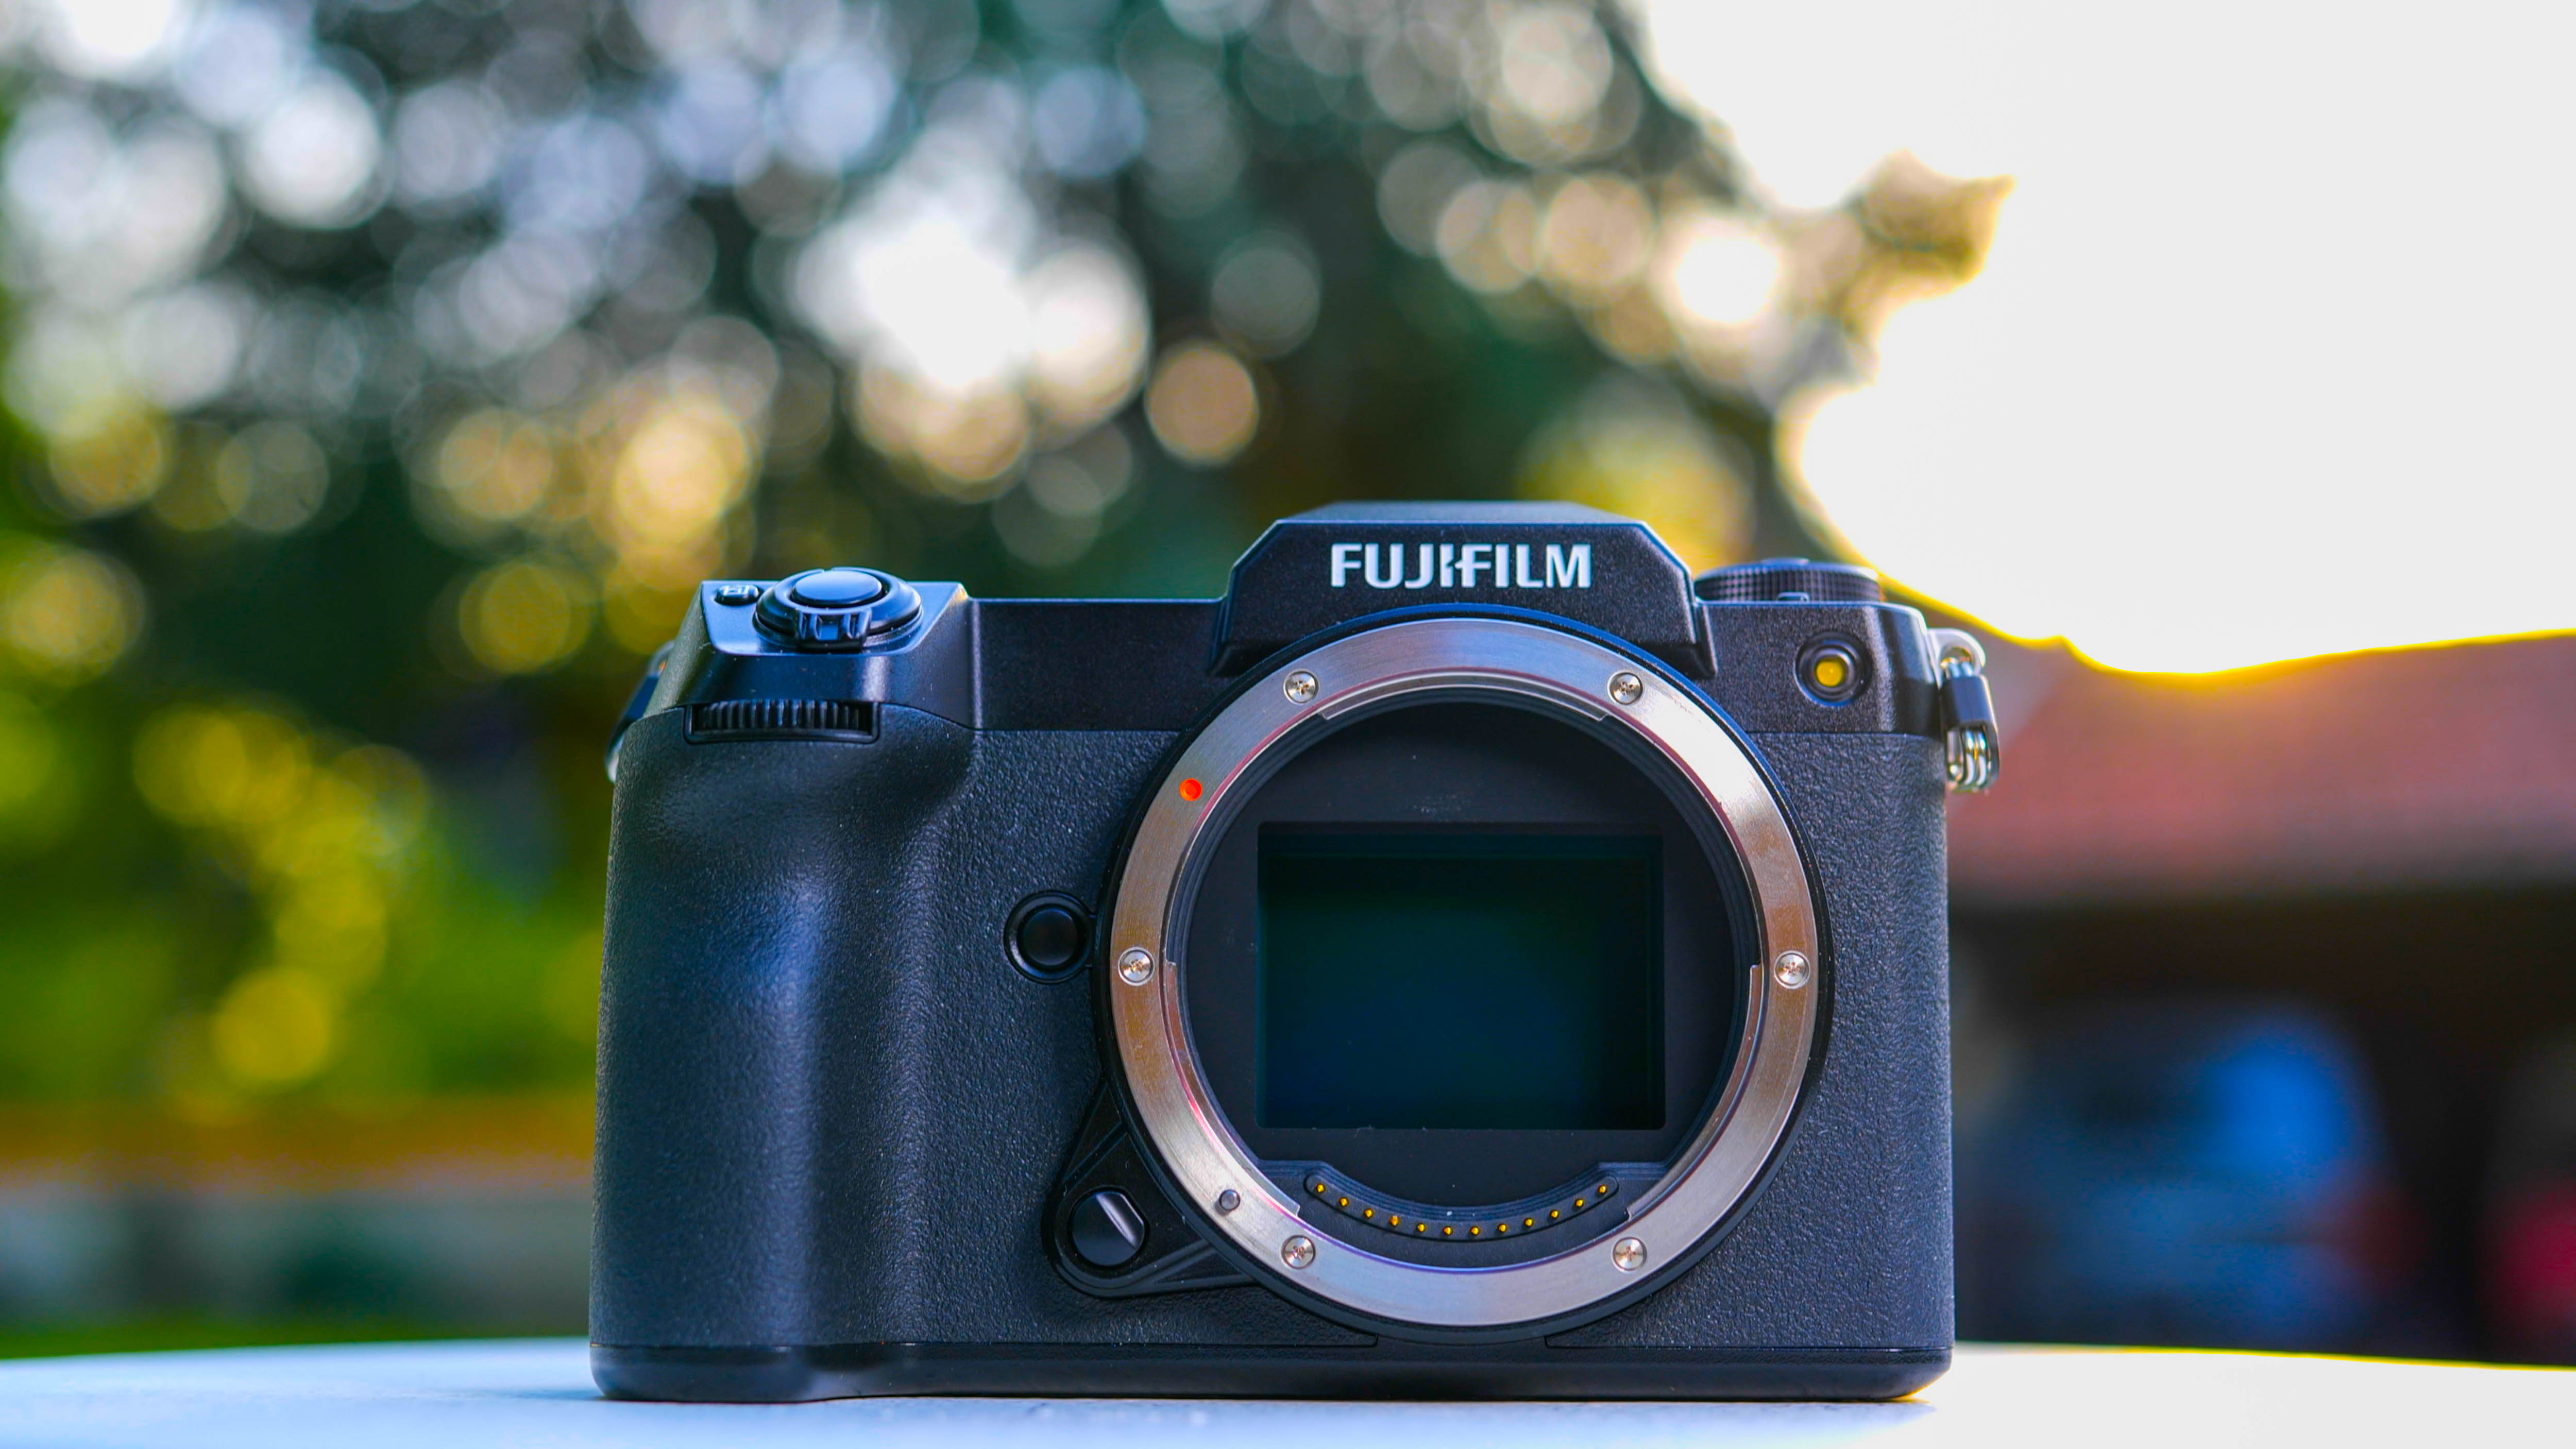 Fujifilm GFX 100S review: Medium format power in a smaller body